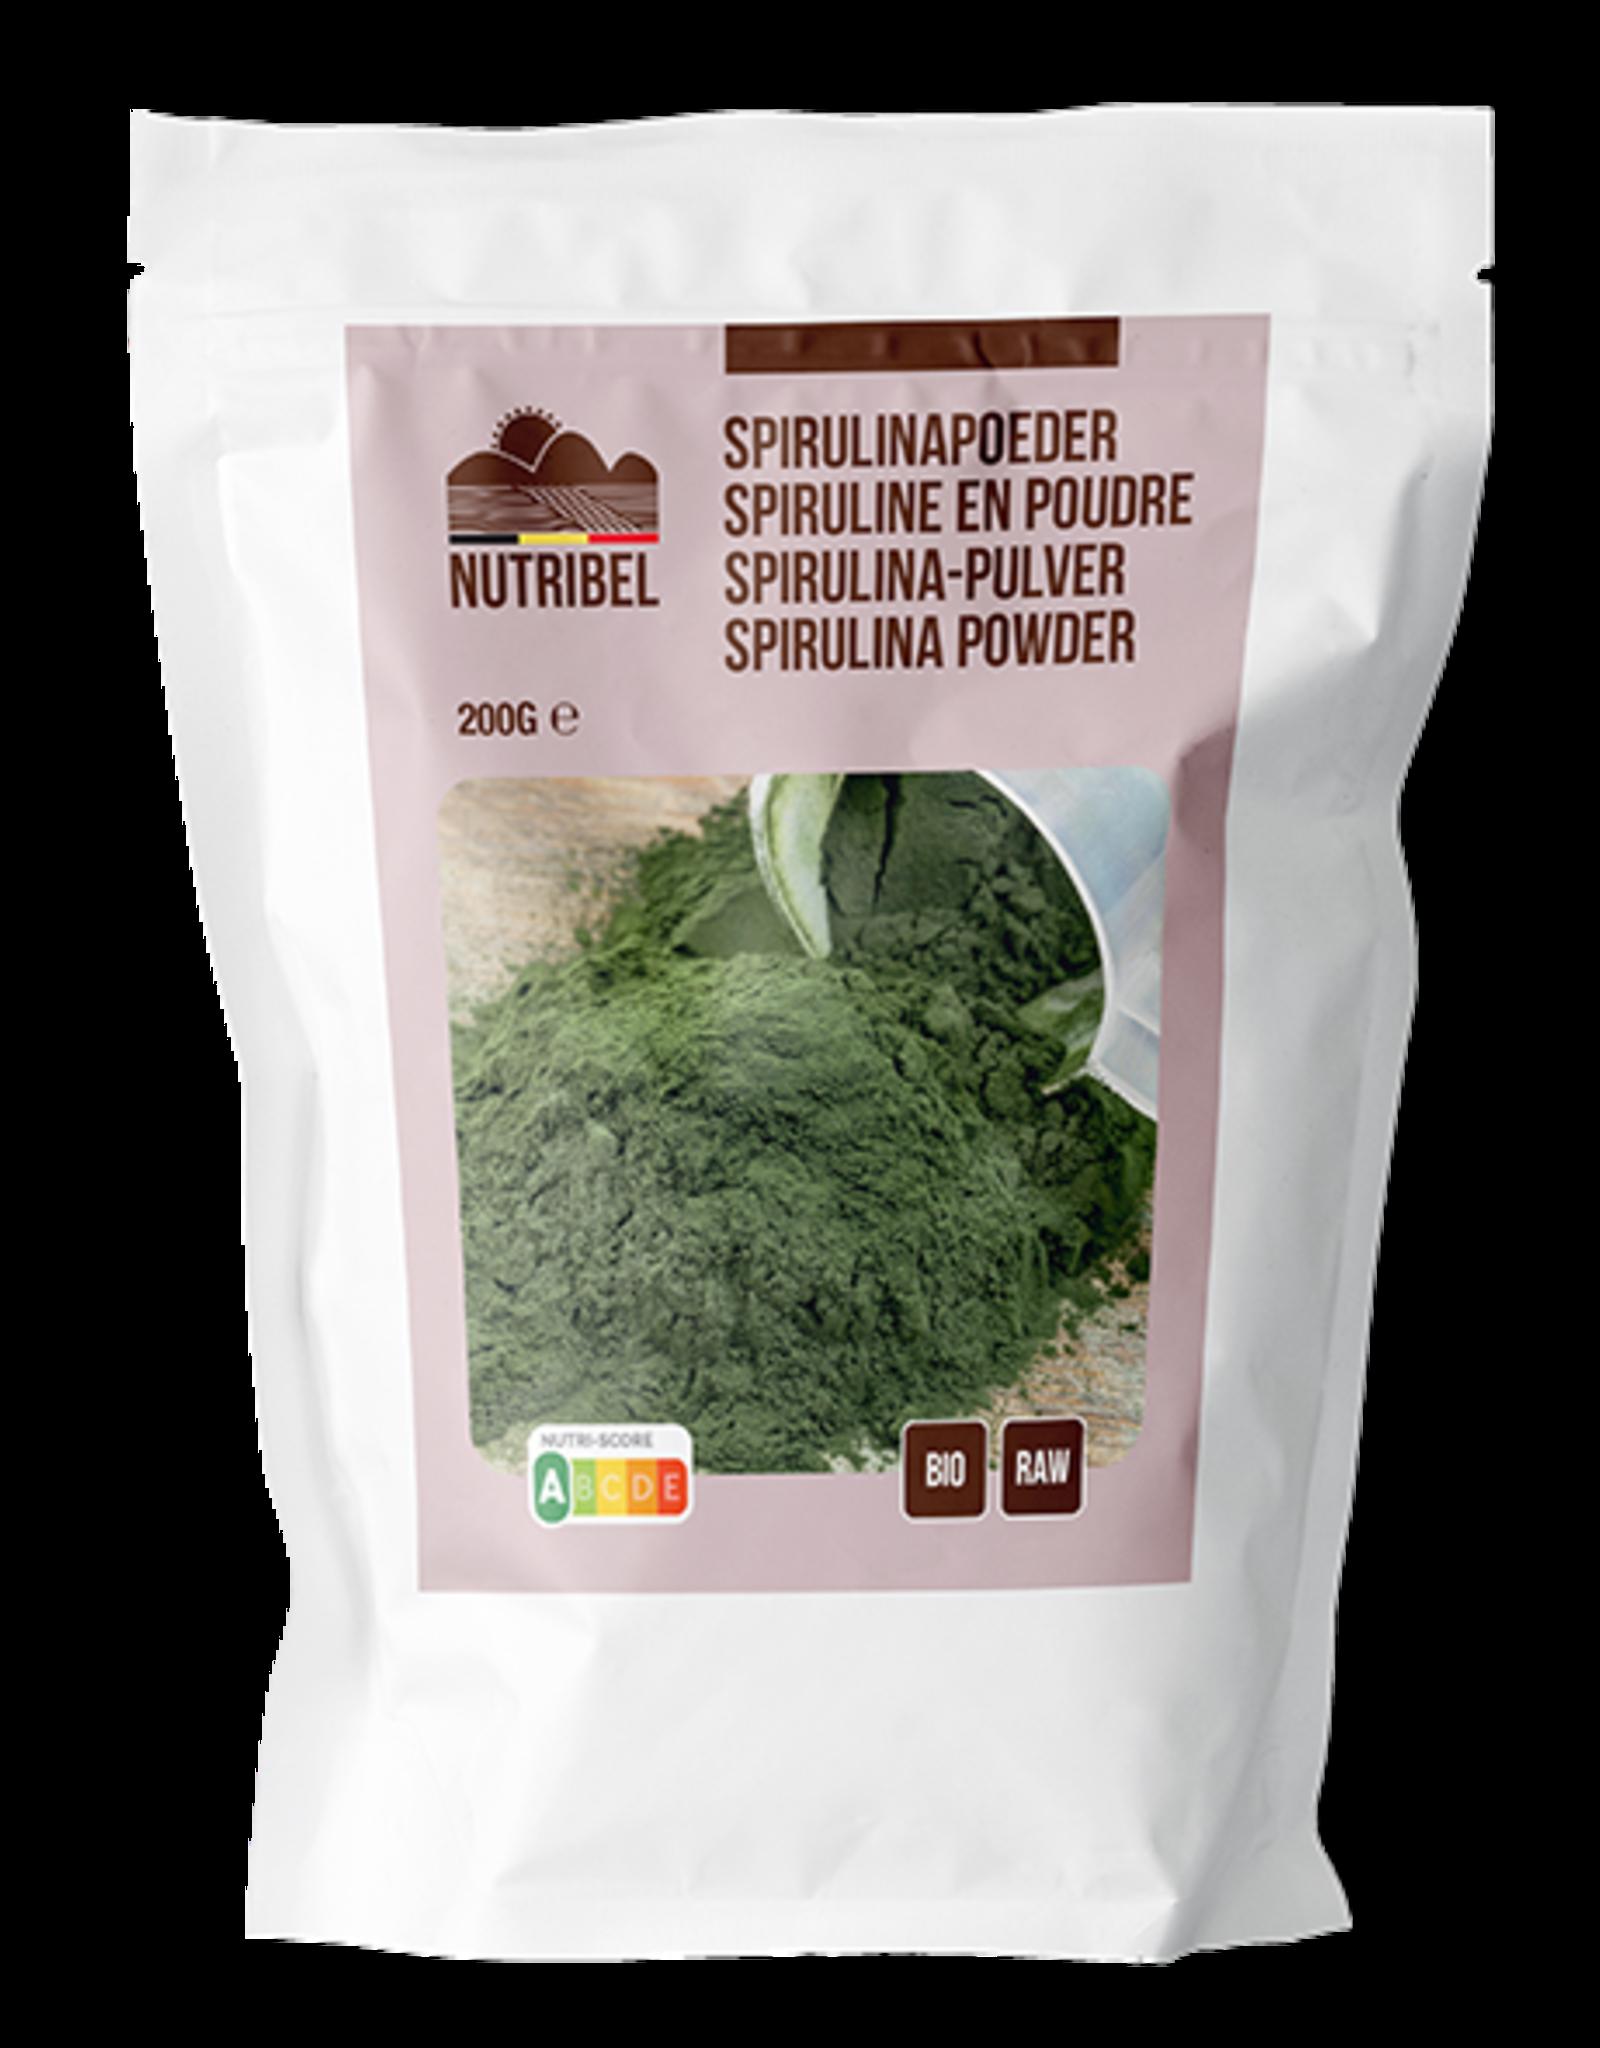 Nutribel Spirulina poeder bio & raw 200g